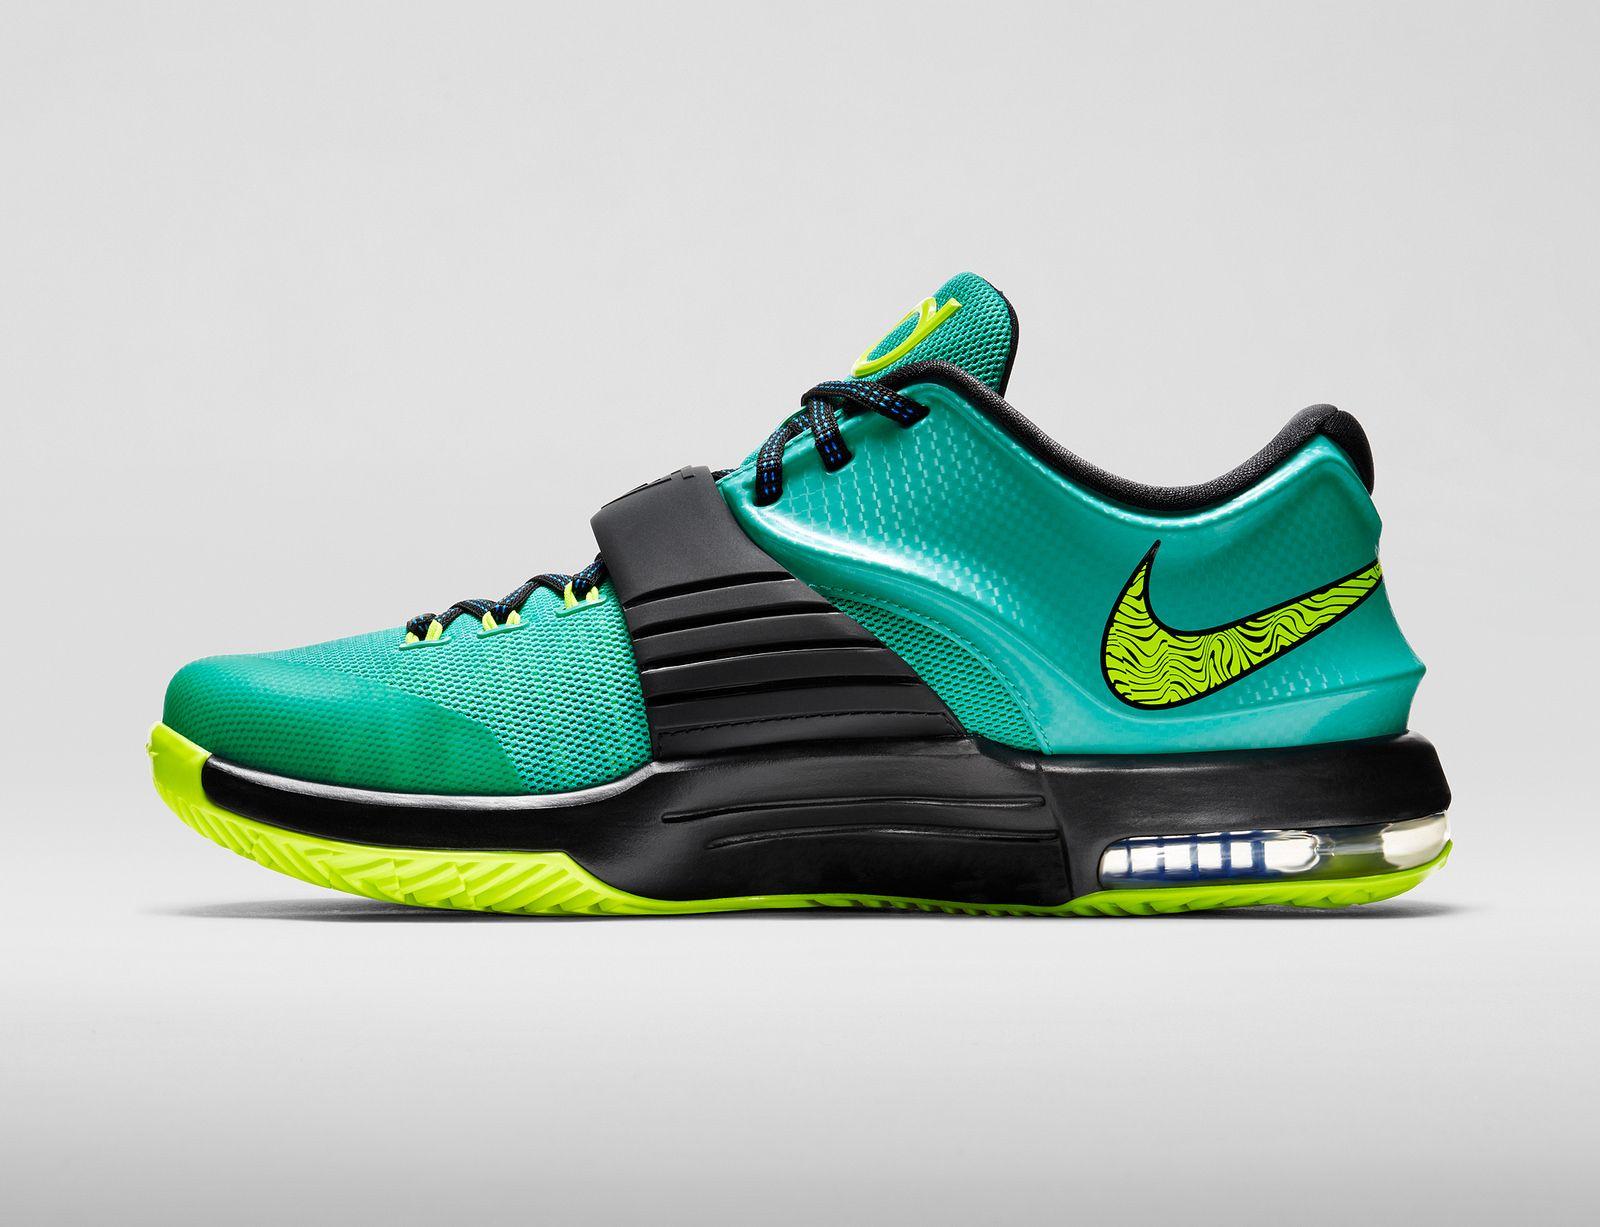 a4583495420e Nike KD 7  Summer 2014 Lineup - EU Kicks  Sneaker Magazine